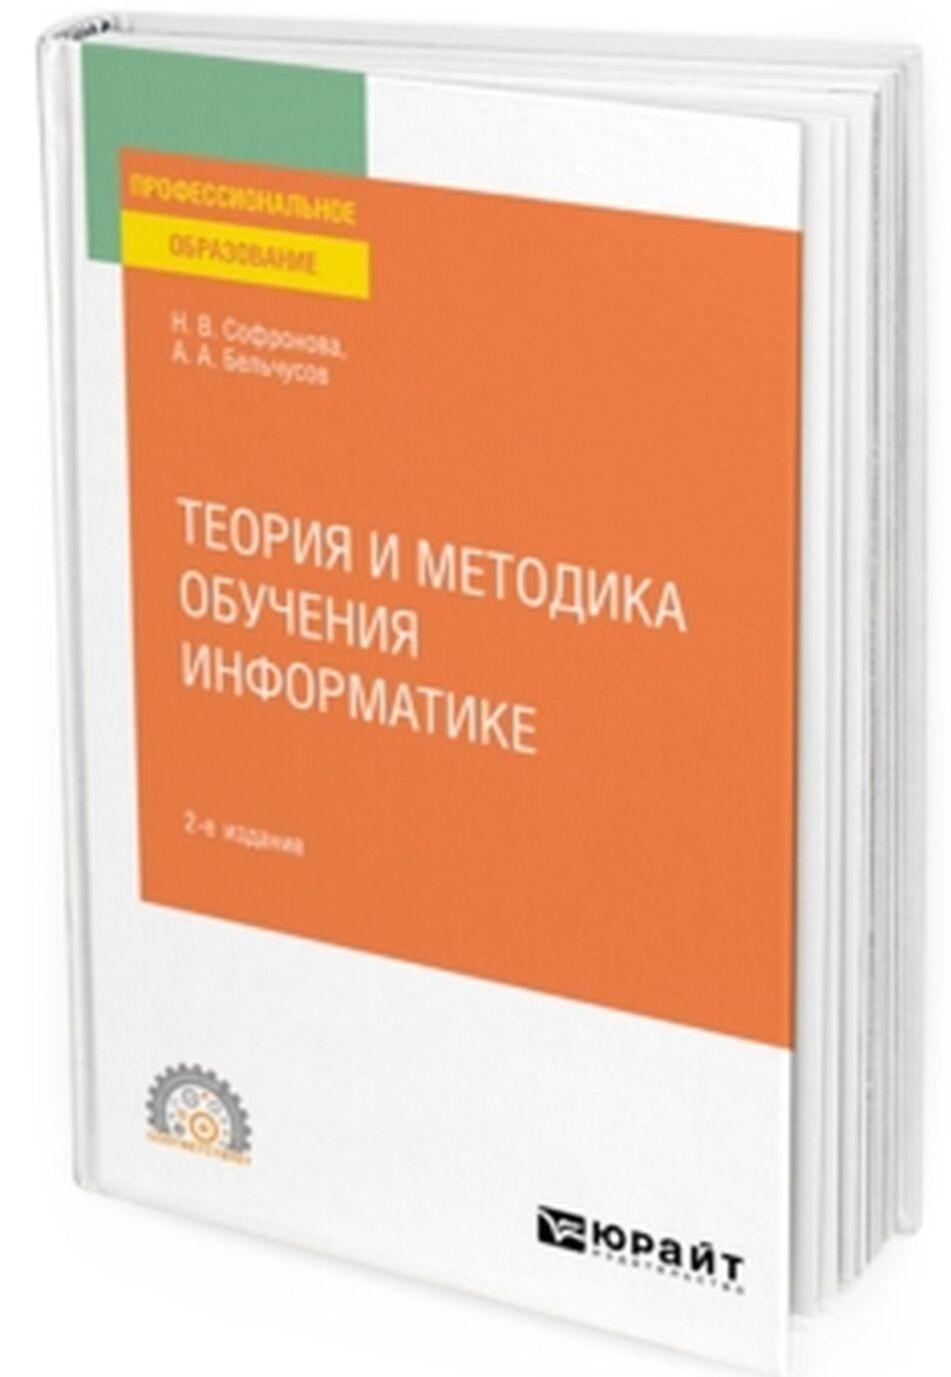 Teorija i metodika obuchenija informatike. Uchebnoe posobie